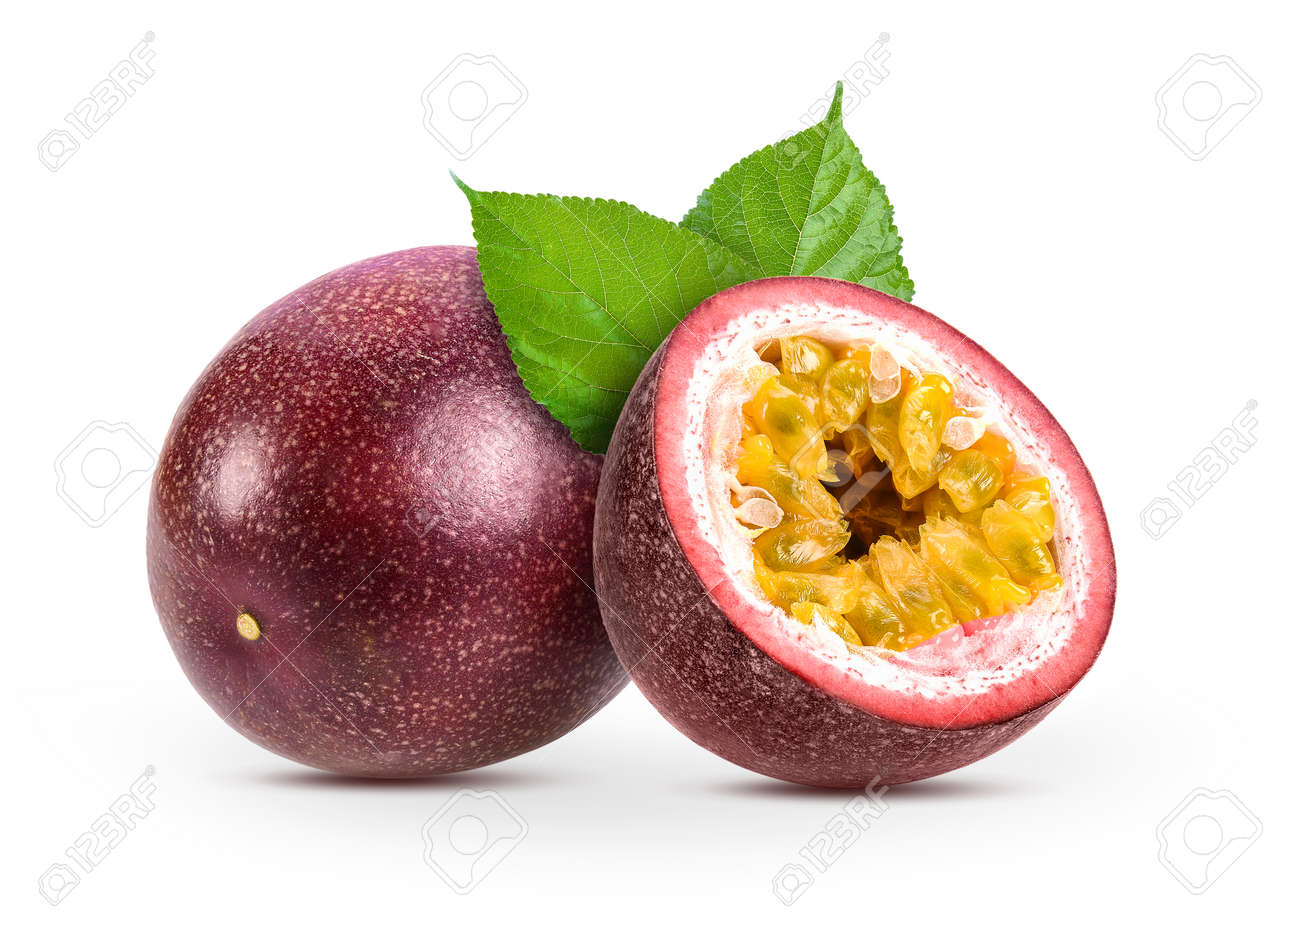 passionfruits isolated on white background - 93506531